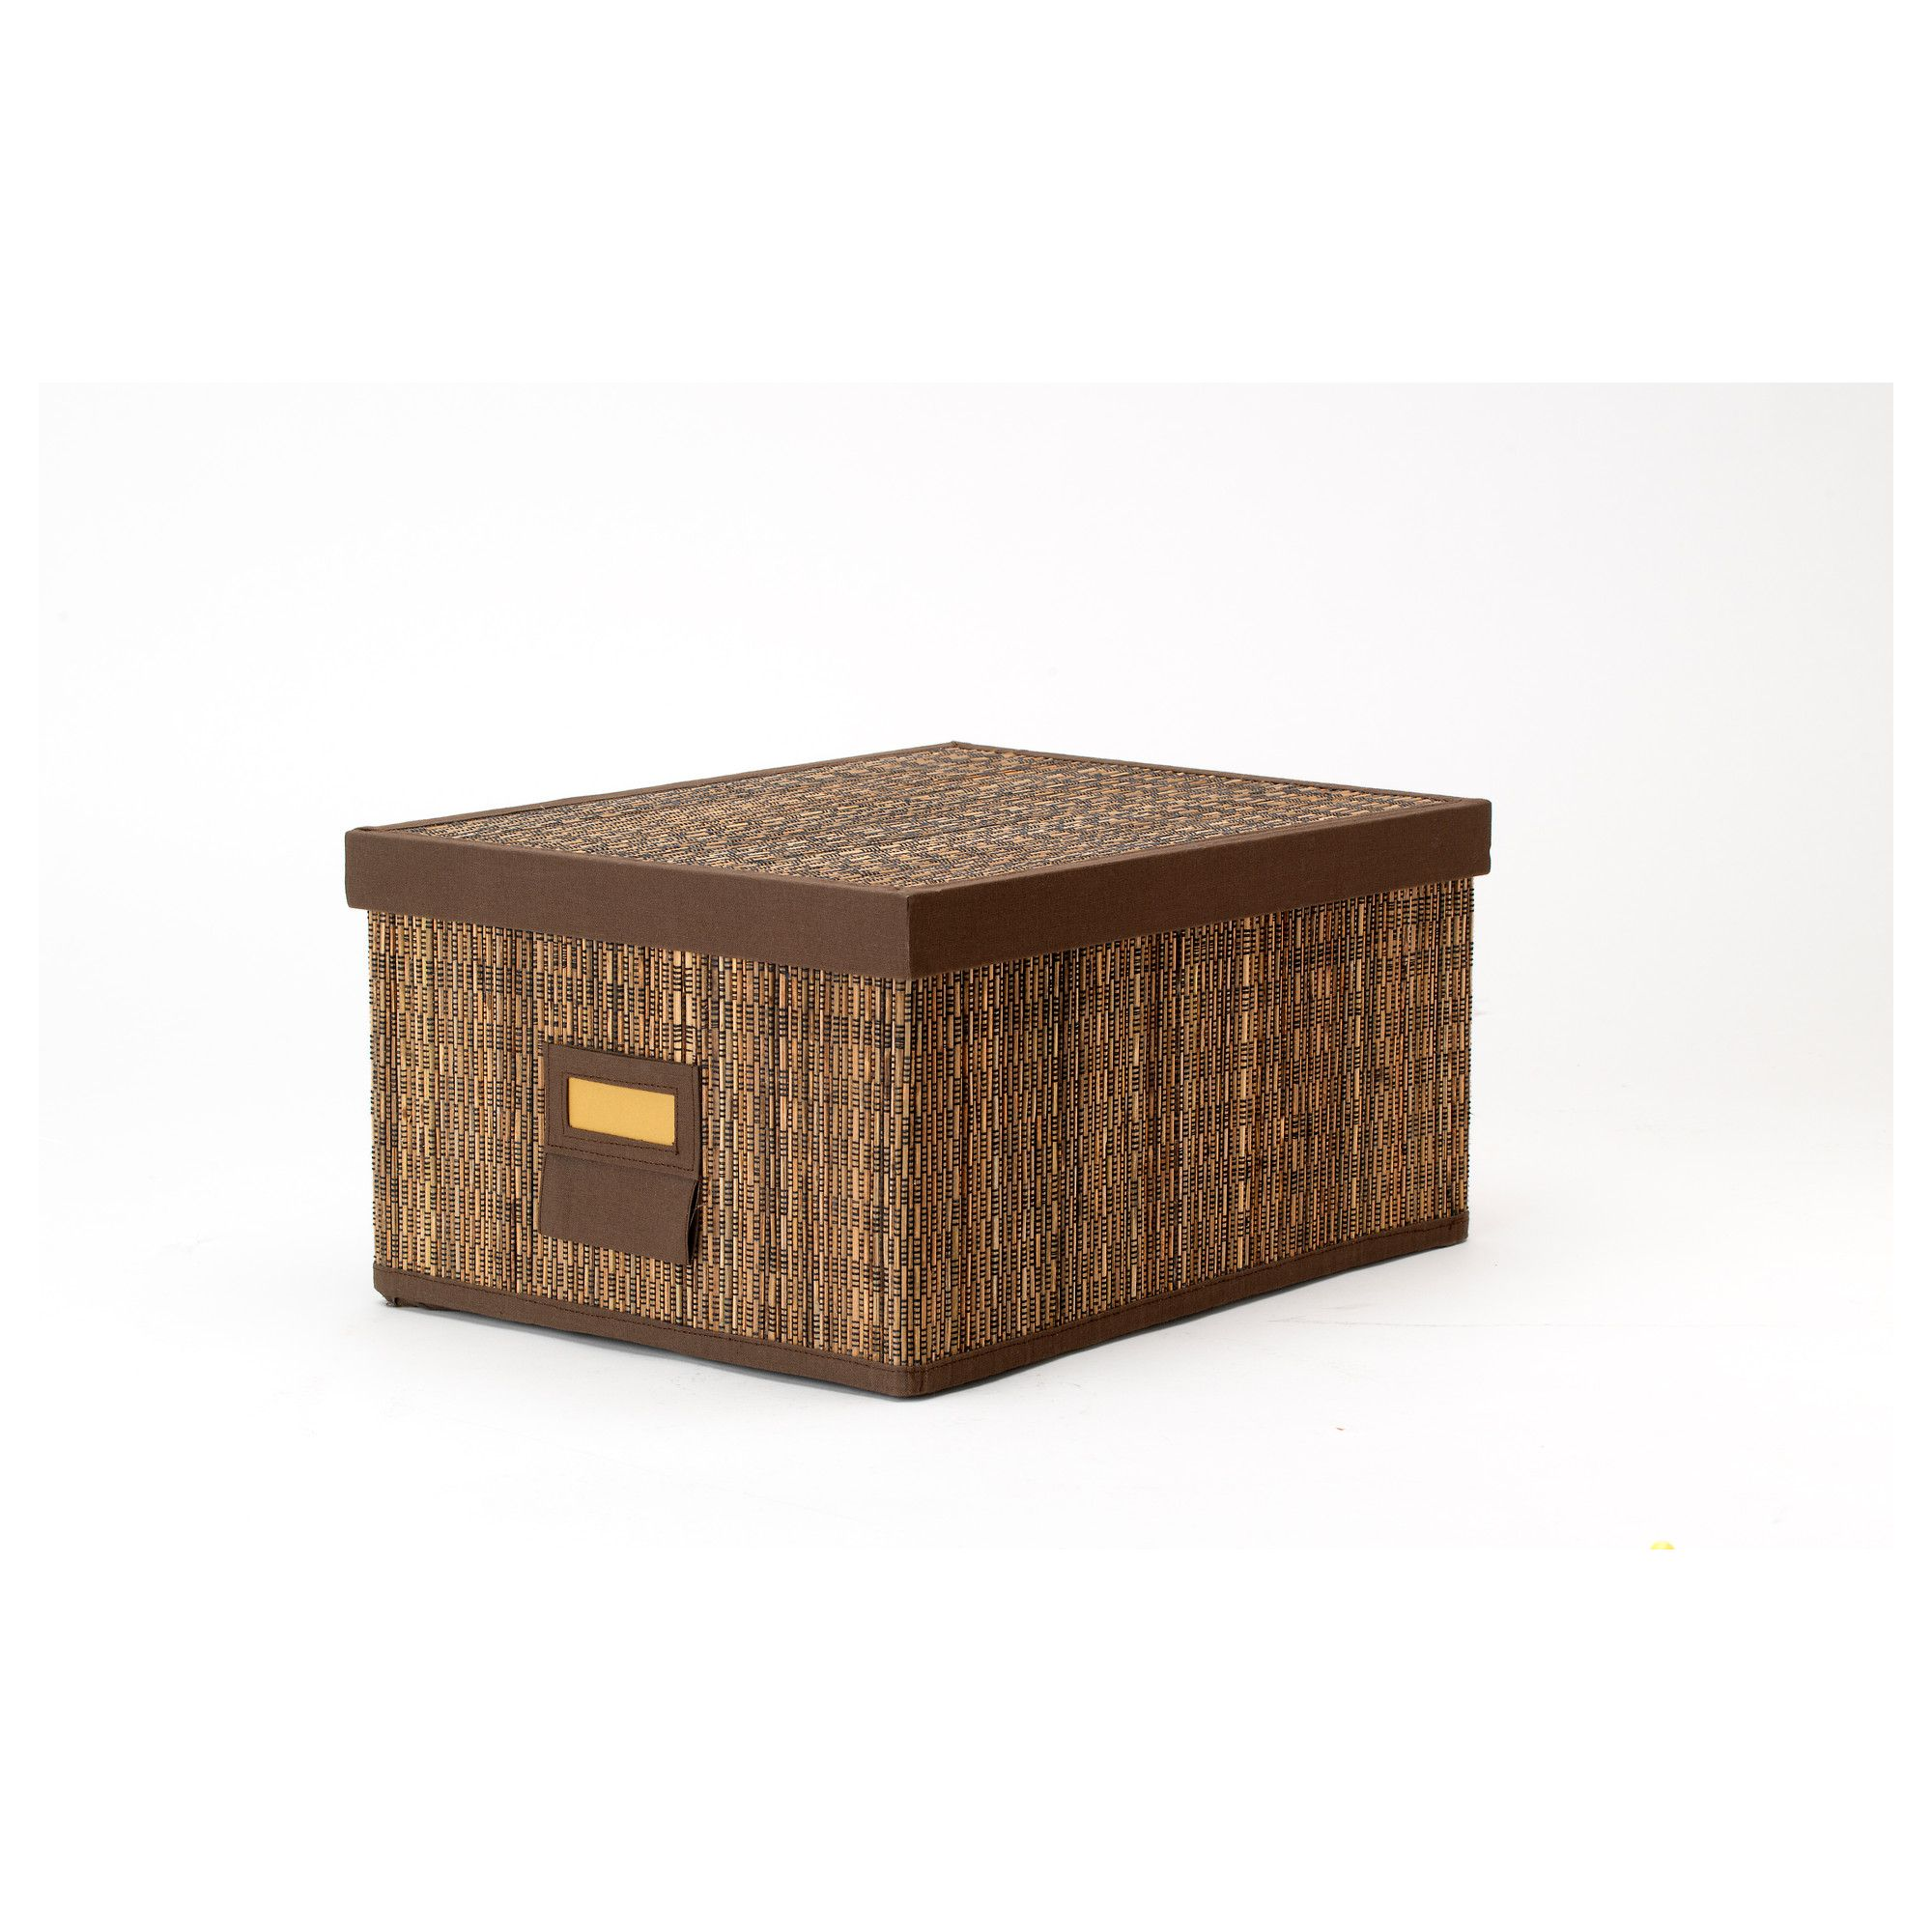 storage furniture with baskets ikea. Family Room Storage. MOTORP Box With Lid - 13 ¾x21 ¾x10 ¾ \ Storage Furniture Baskets Ikea